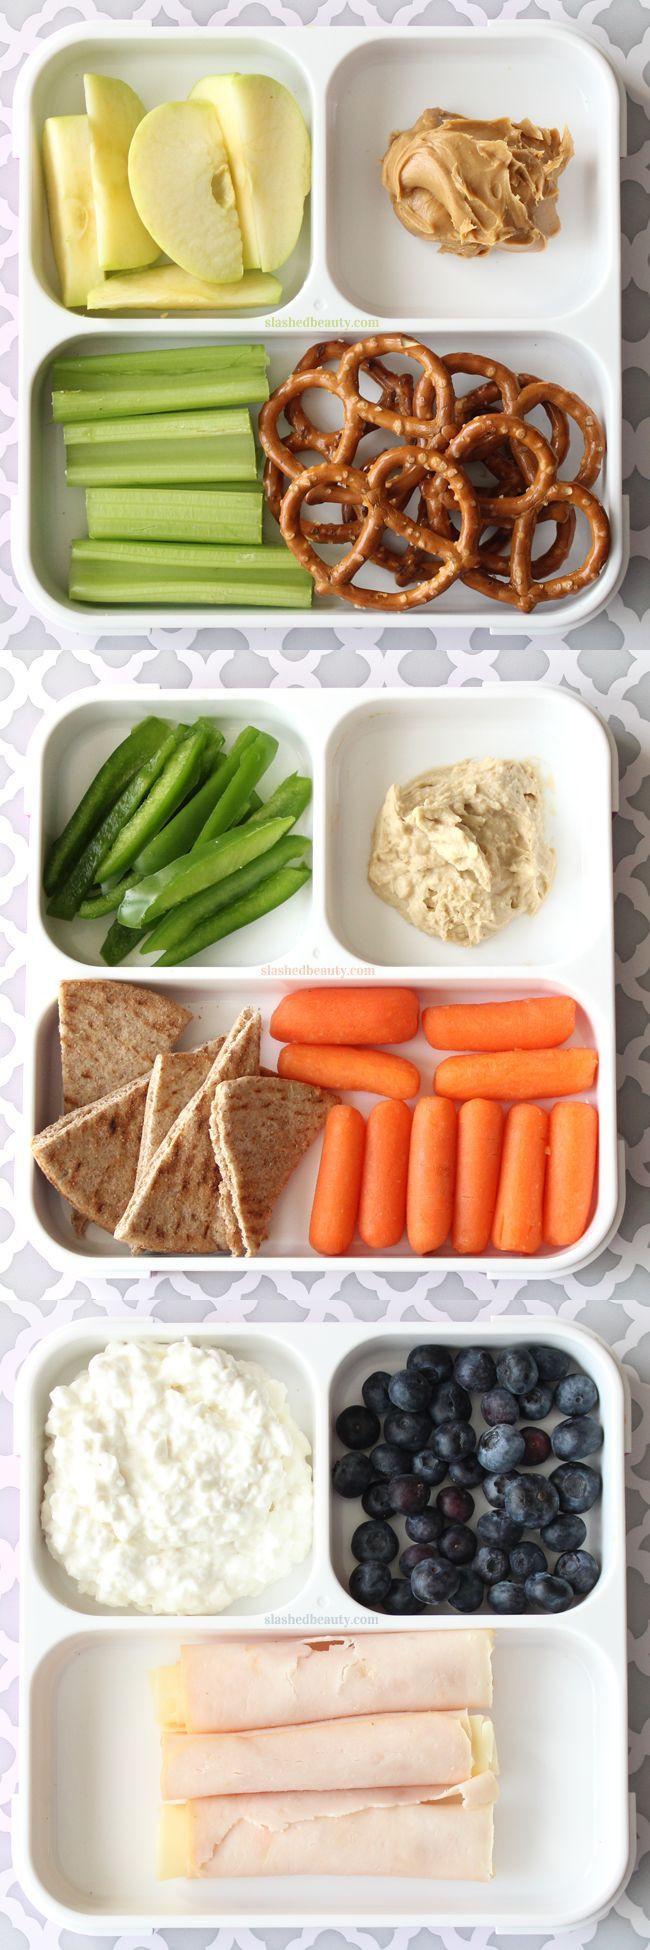 Easy Quick Healthy Snacks  Best 25 Healthy snacks ideas on Pinterest